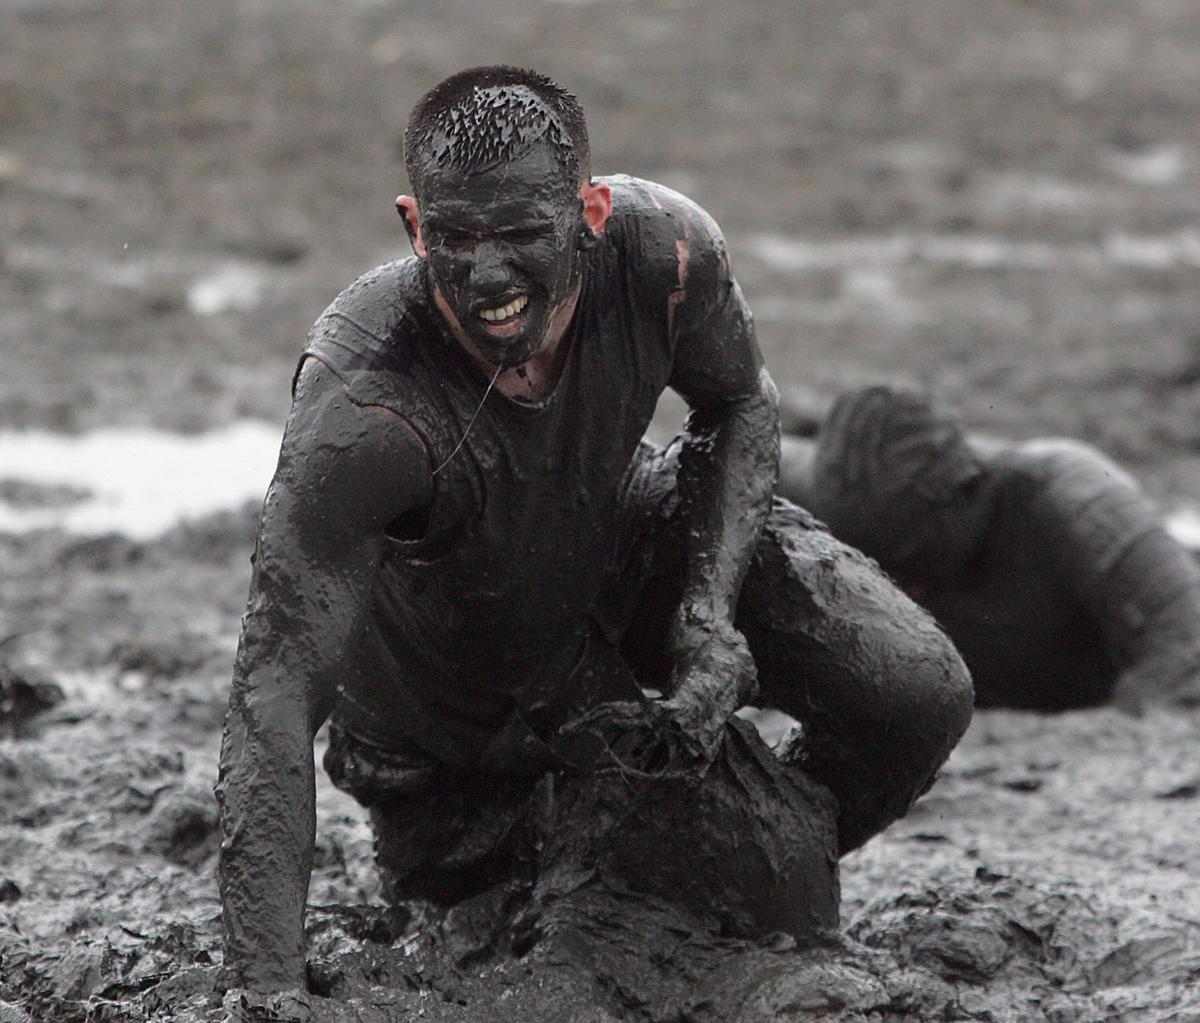 Mud run season kicks off Saturday